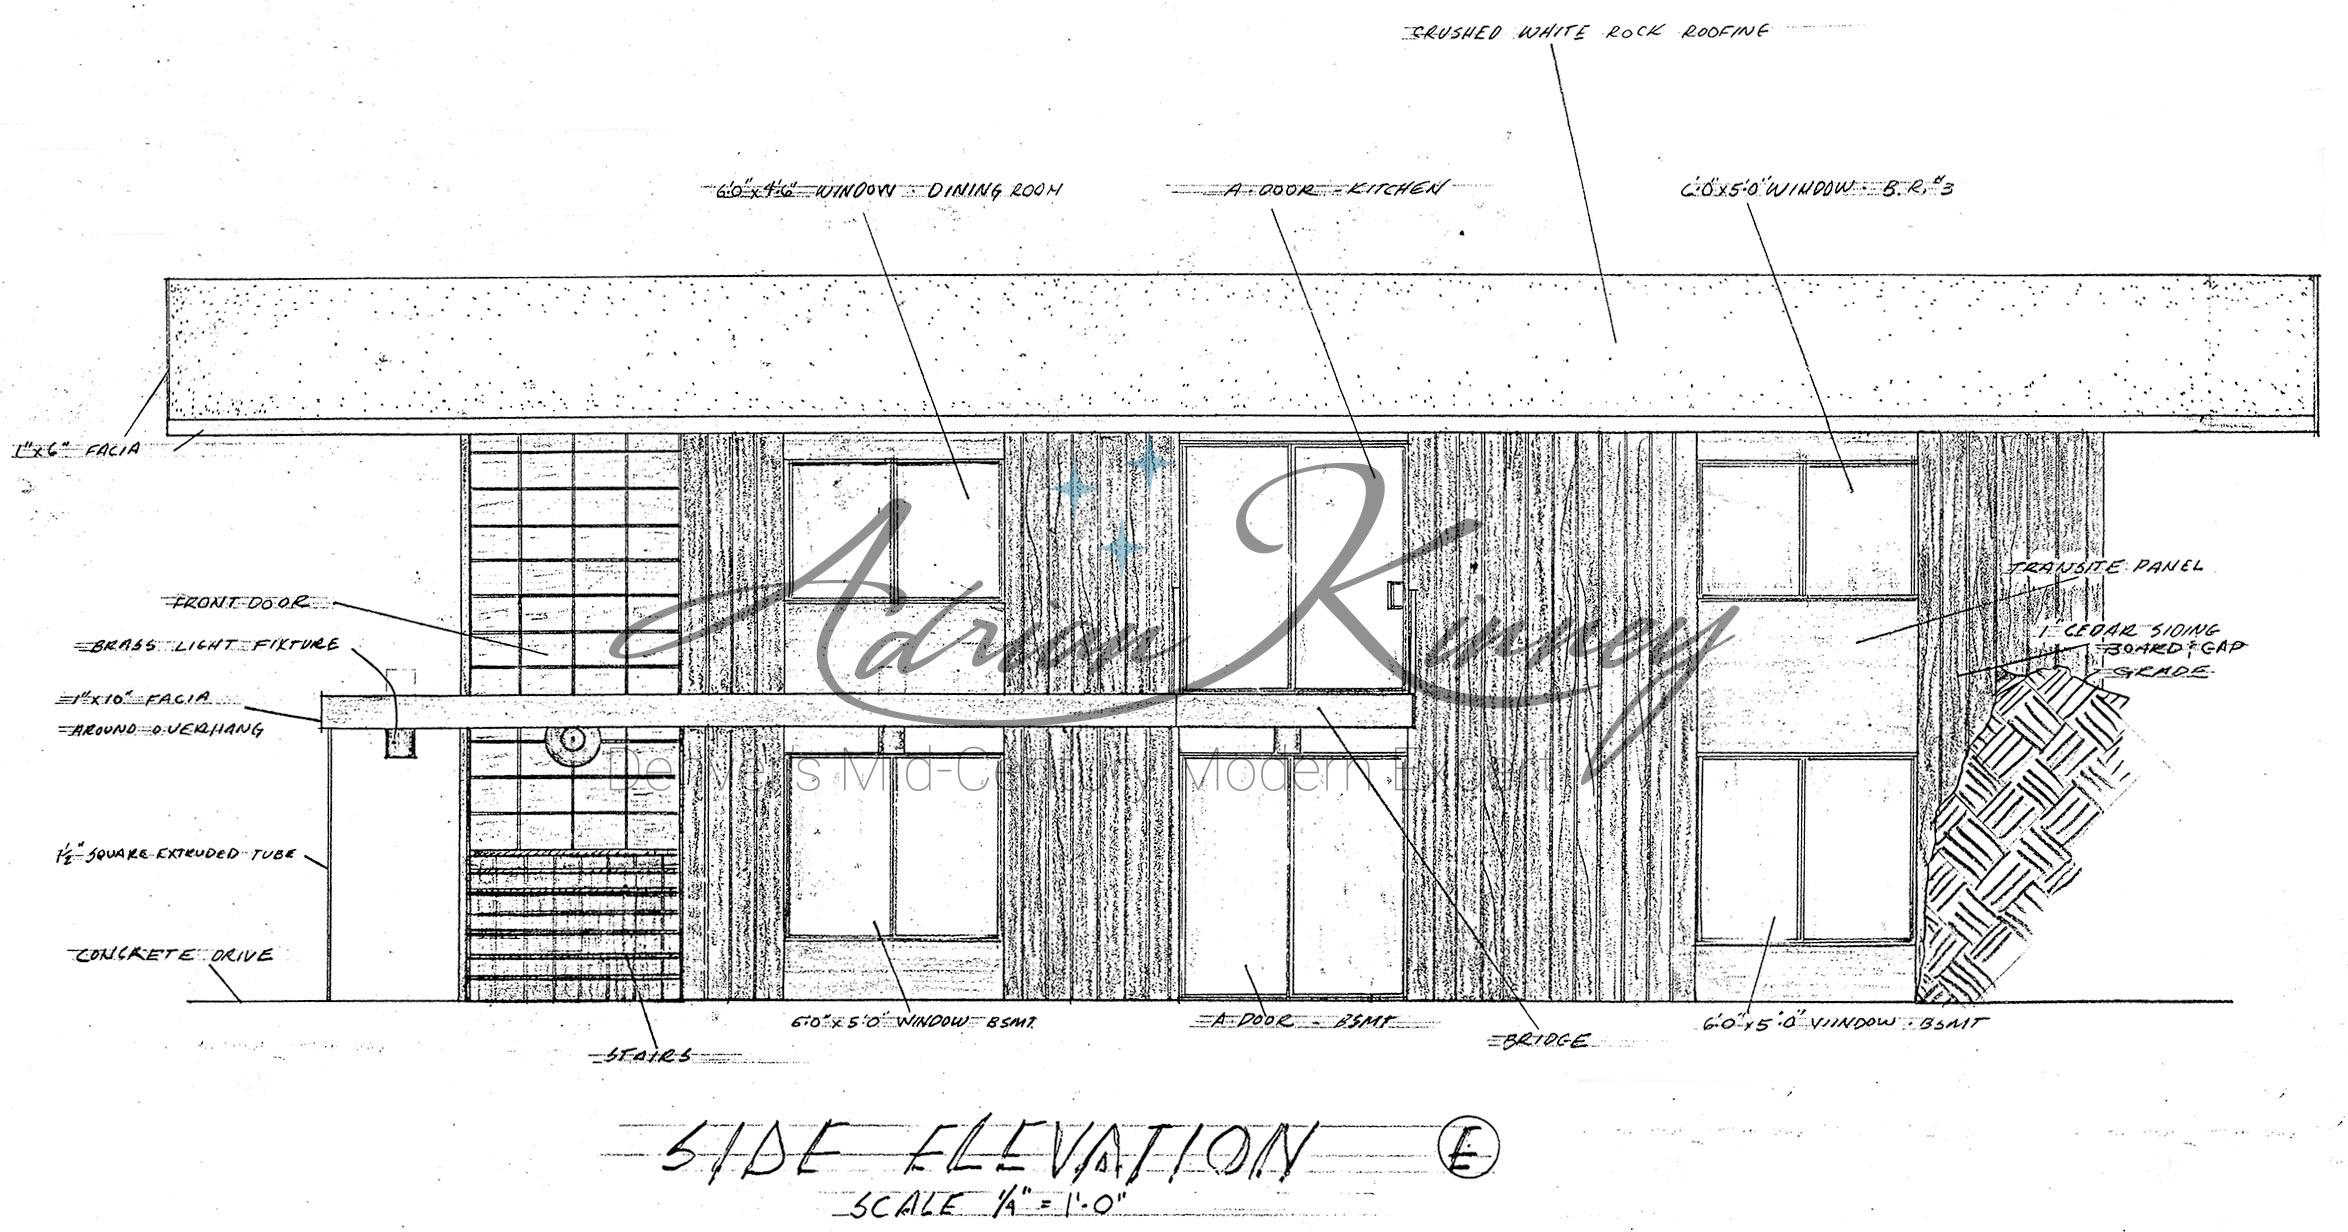 east-elevation-phibbs-house-arvada-colorado-adrian-kinney.jpg